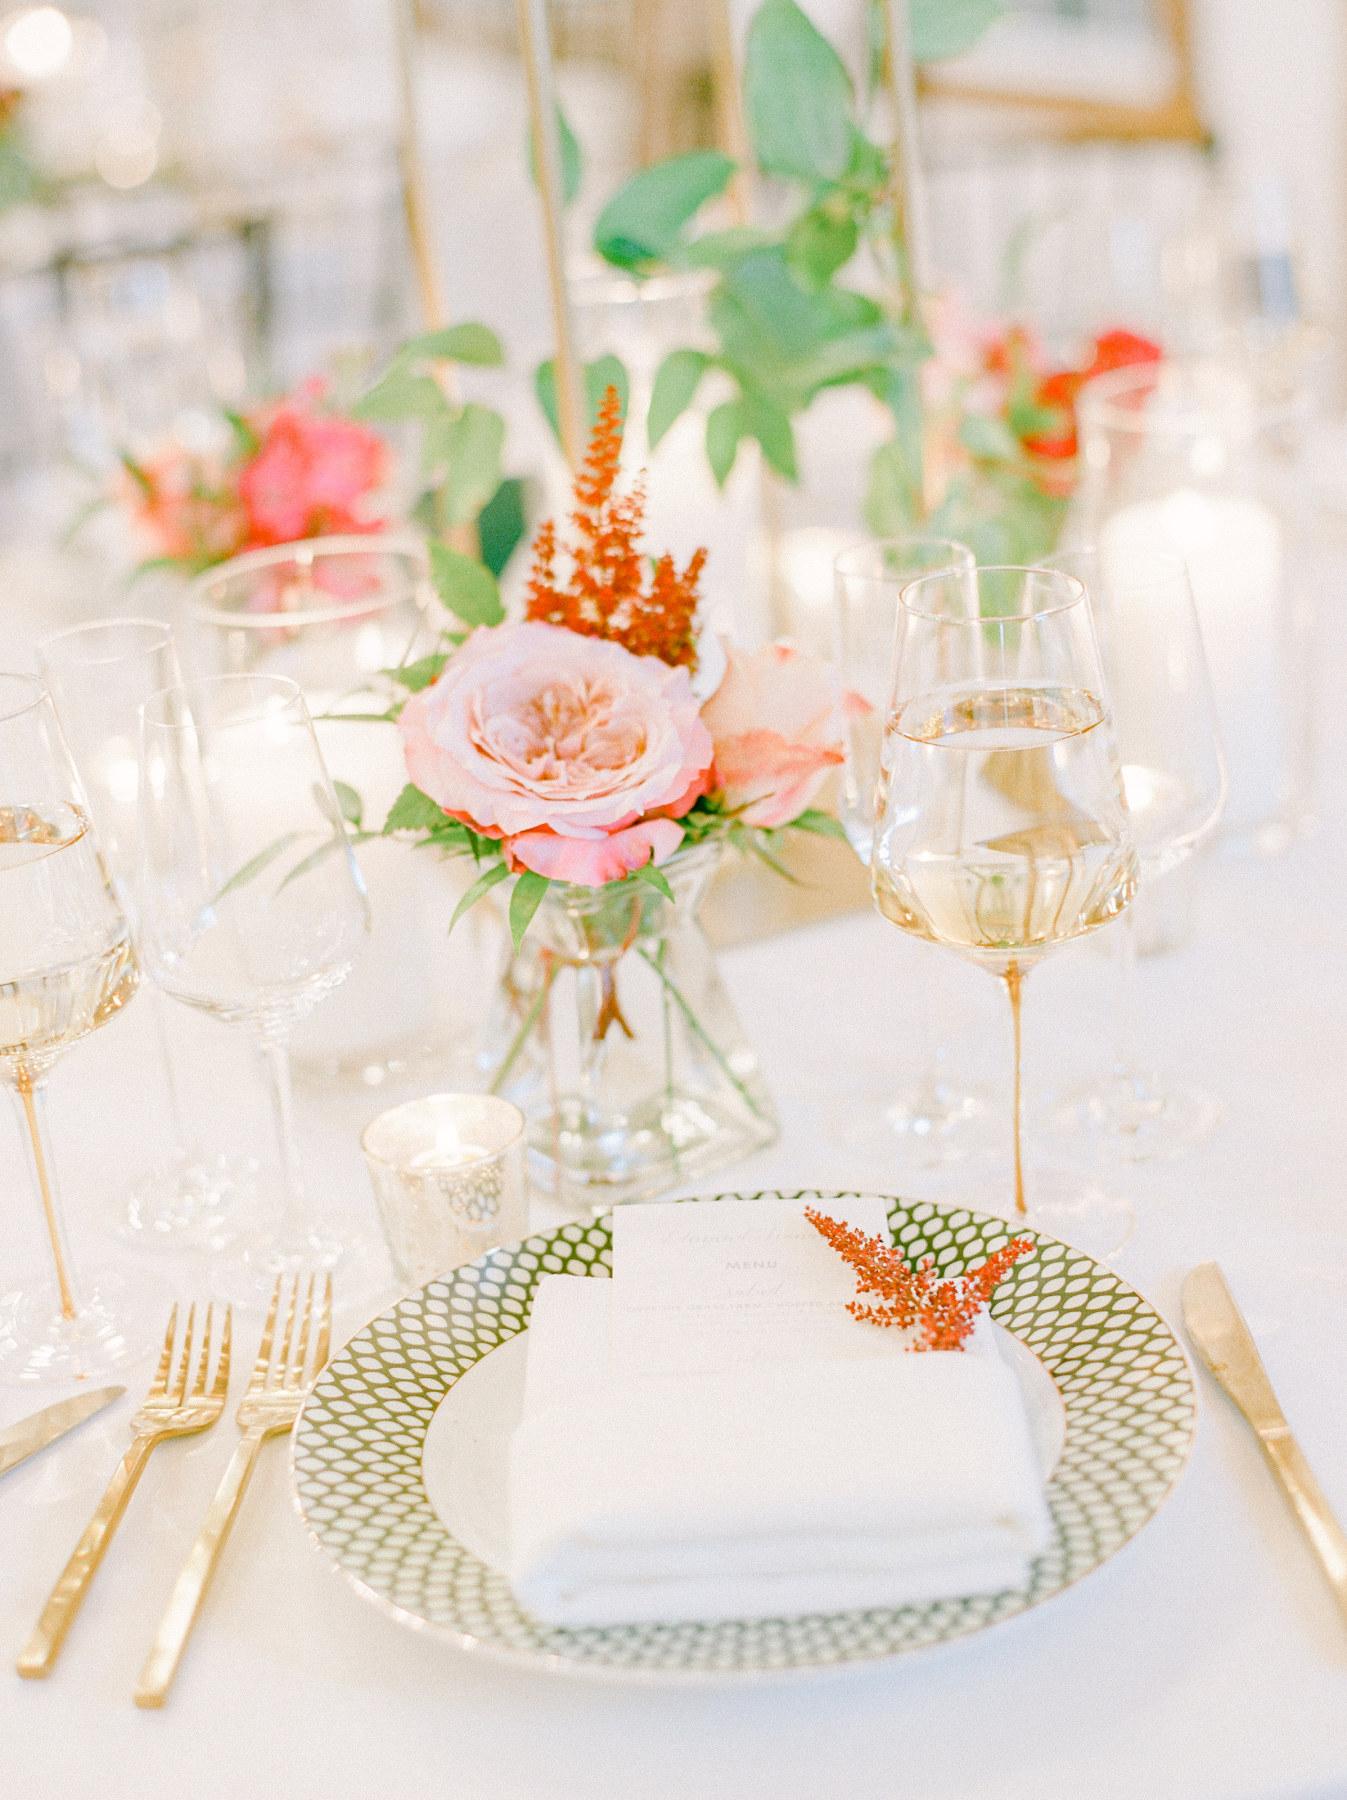 51Great_Marsh_Estates_Wedding_Anne_Kelley_Events_Astrid_Photography146486080007-2